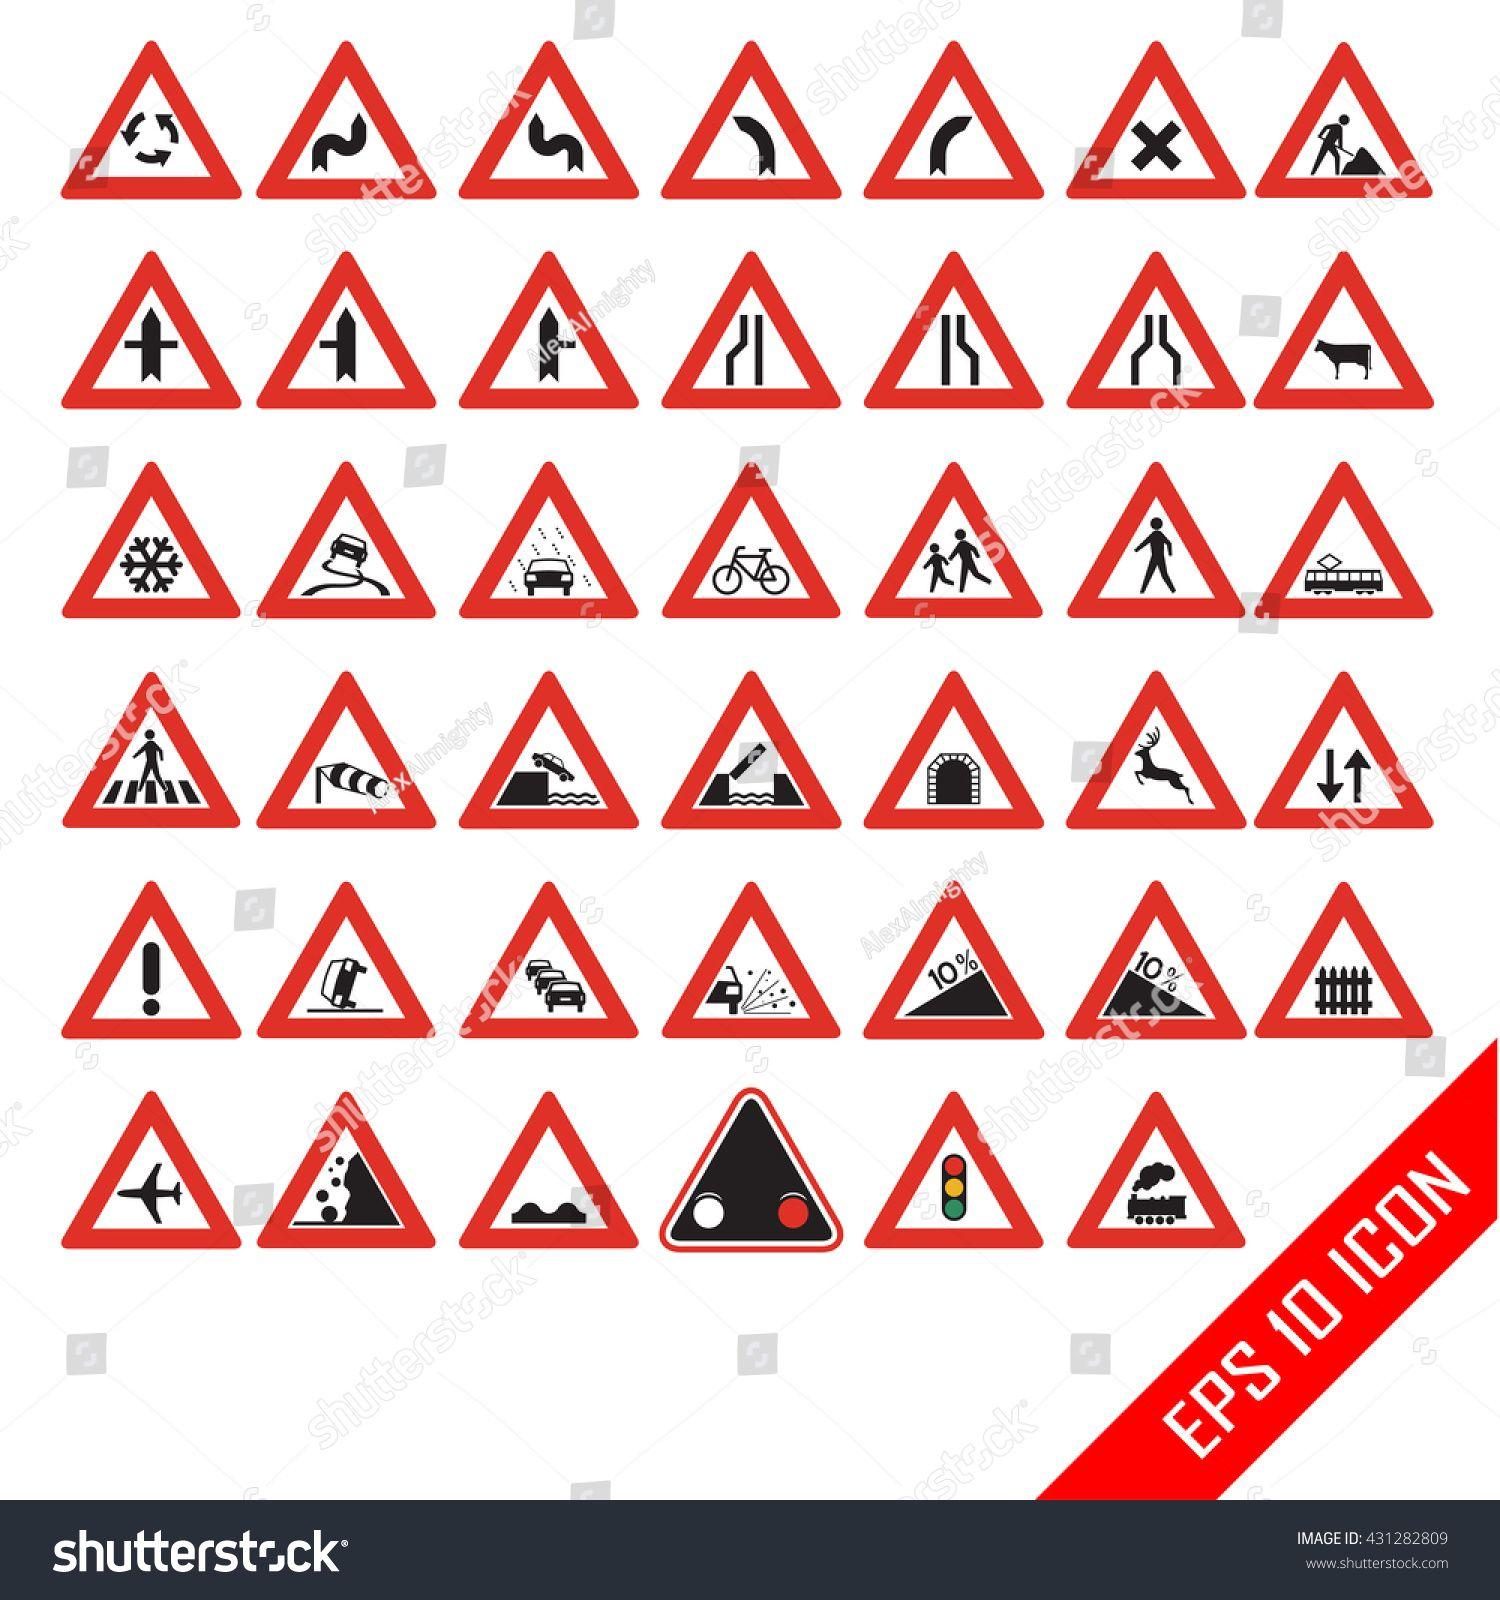 Warning road signs. Set of triangular warning symbols